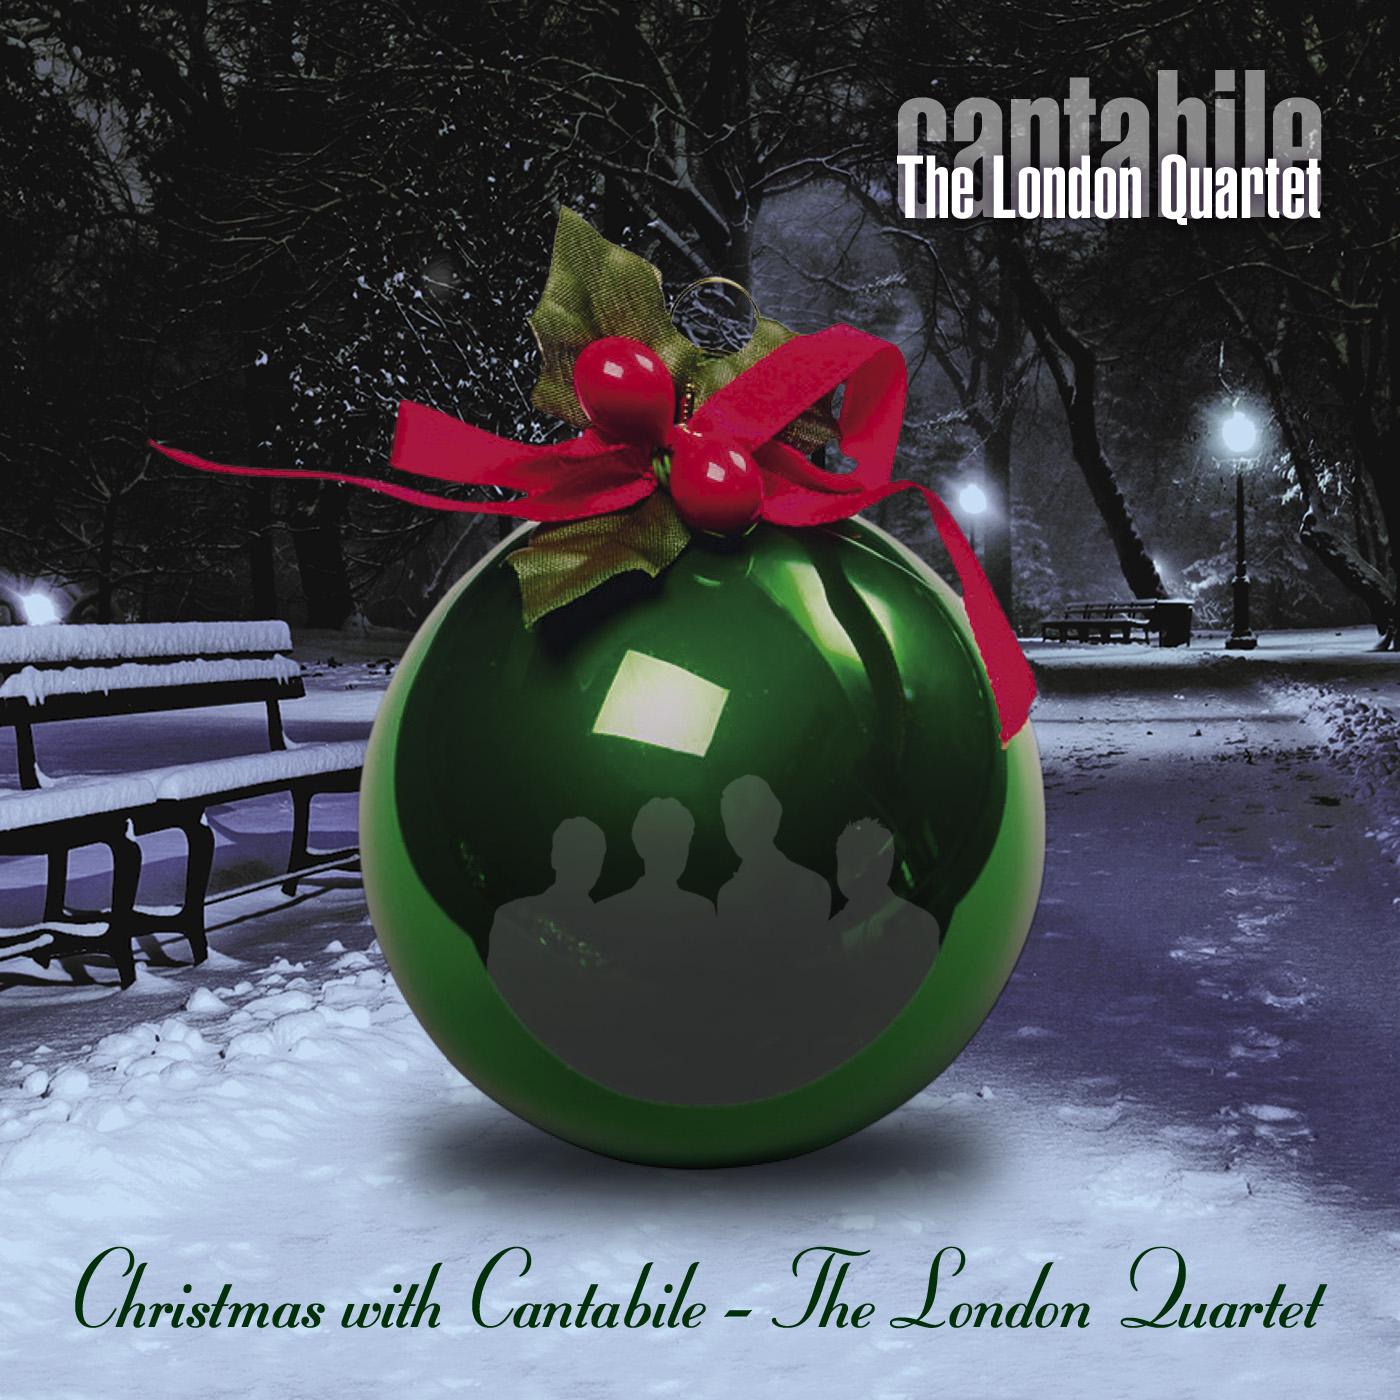 Christmas with Cantabile